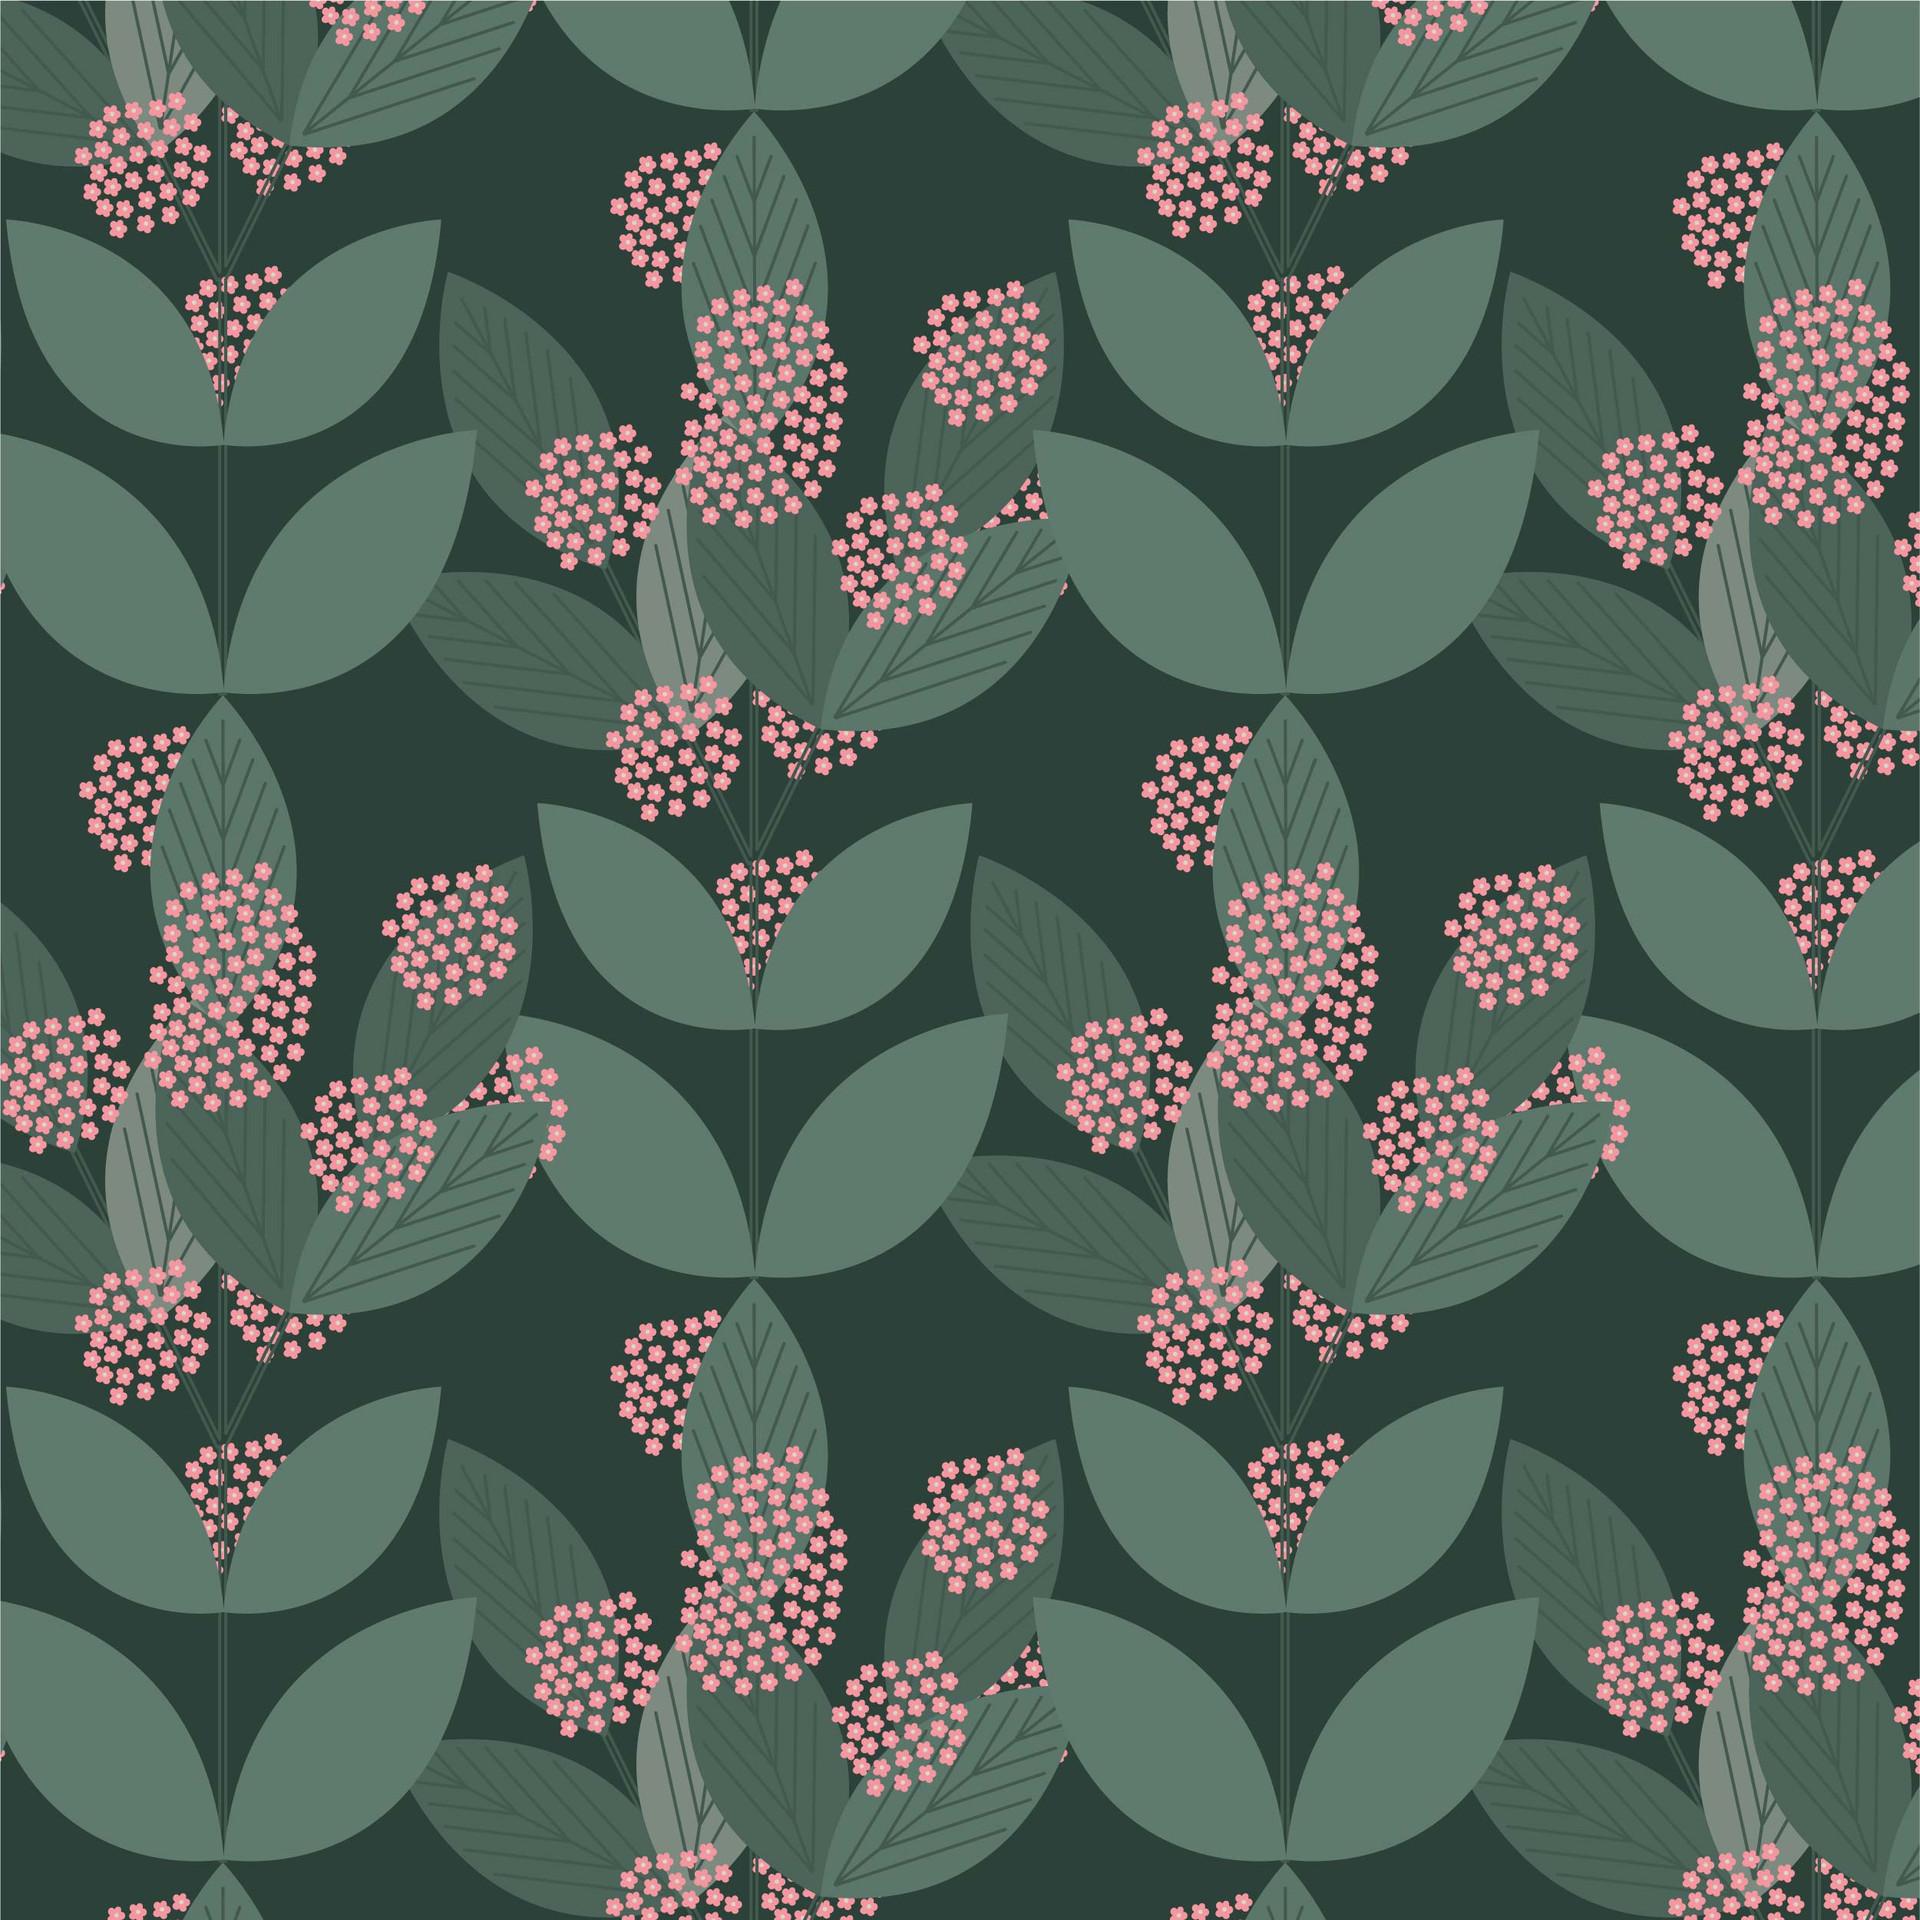 flower puff print-19.jpg